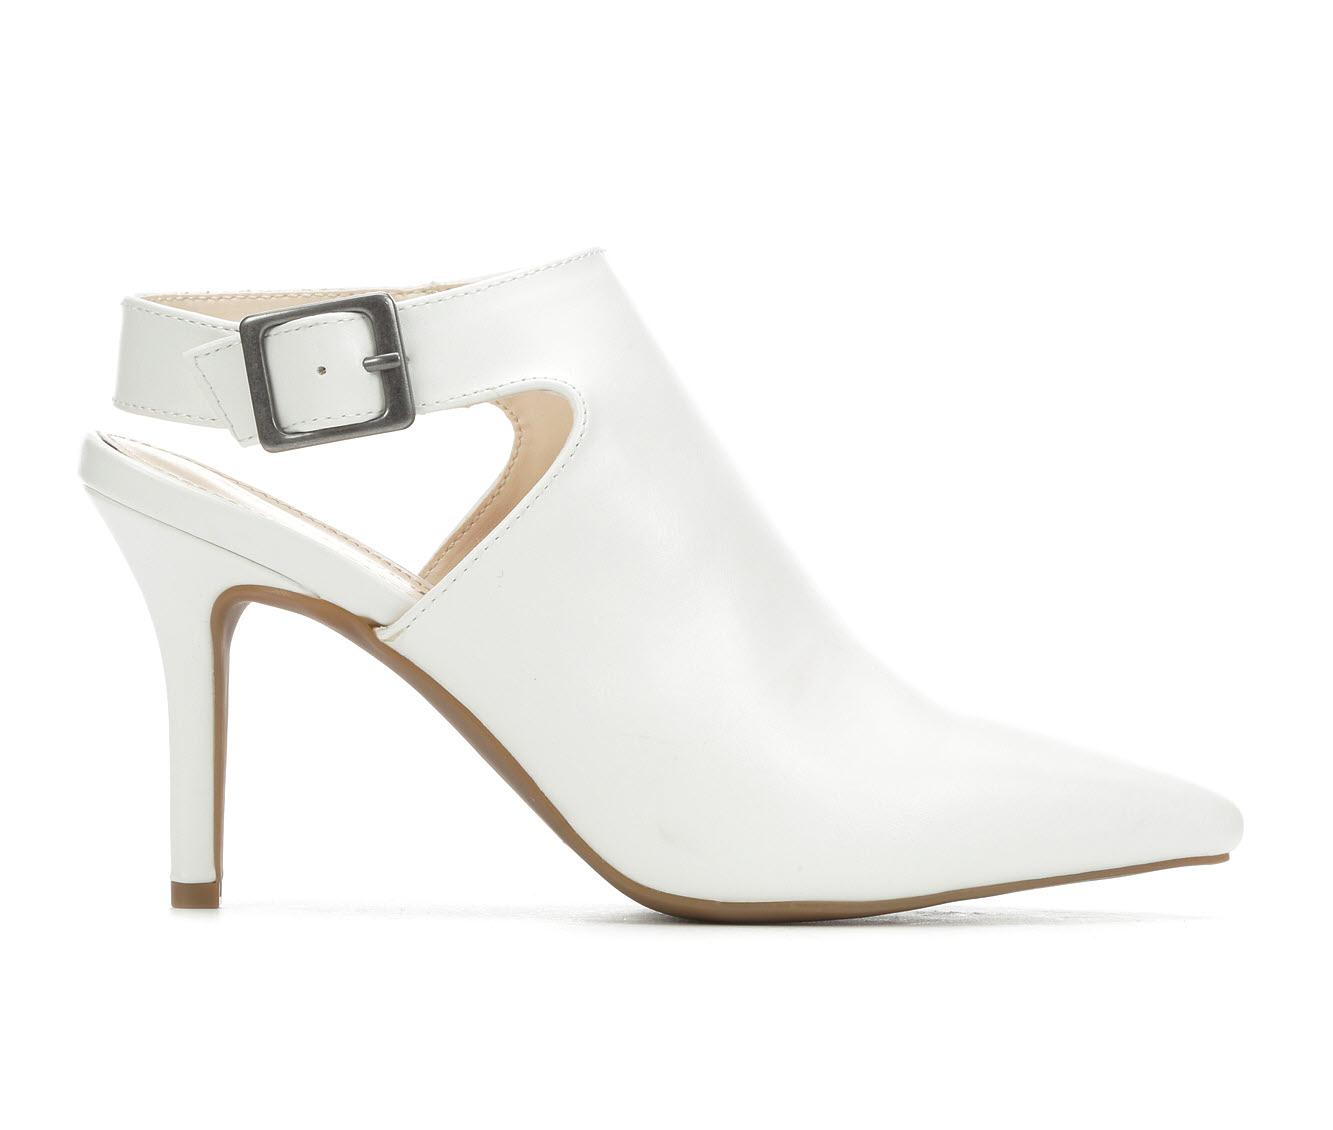 Seven Dials Sherly Women's Dress Shoe (White Faux Leather)